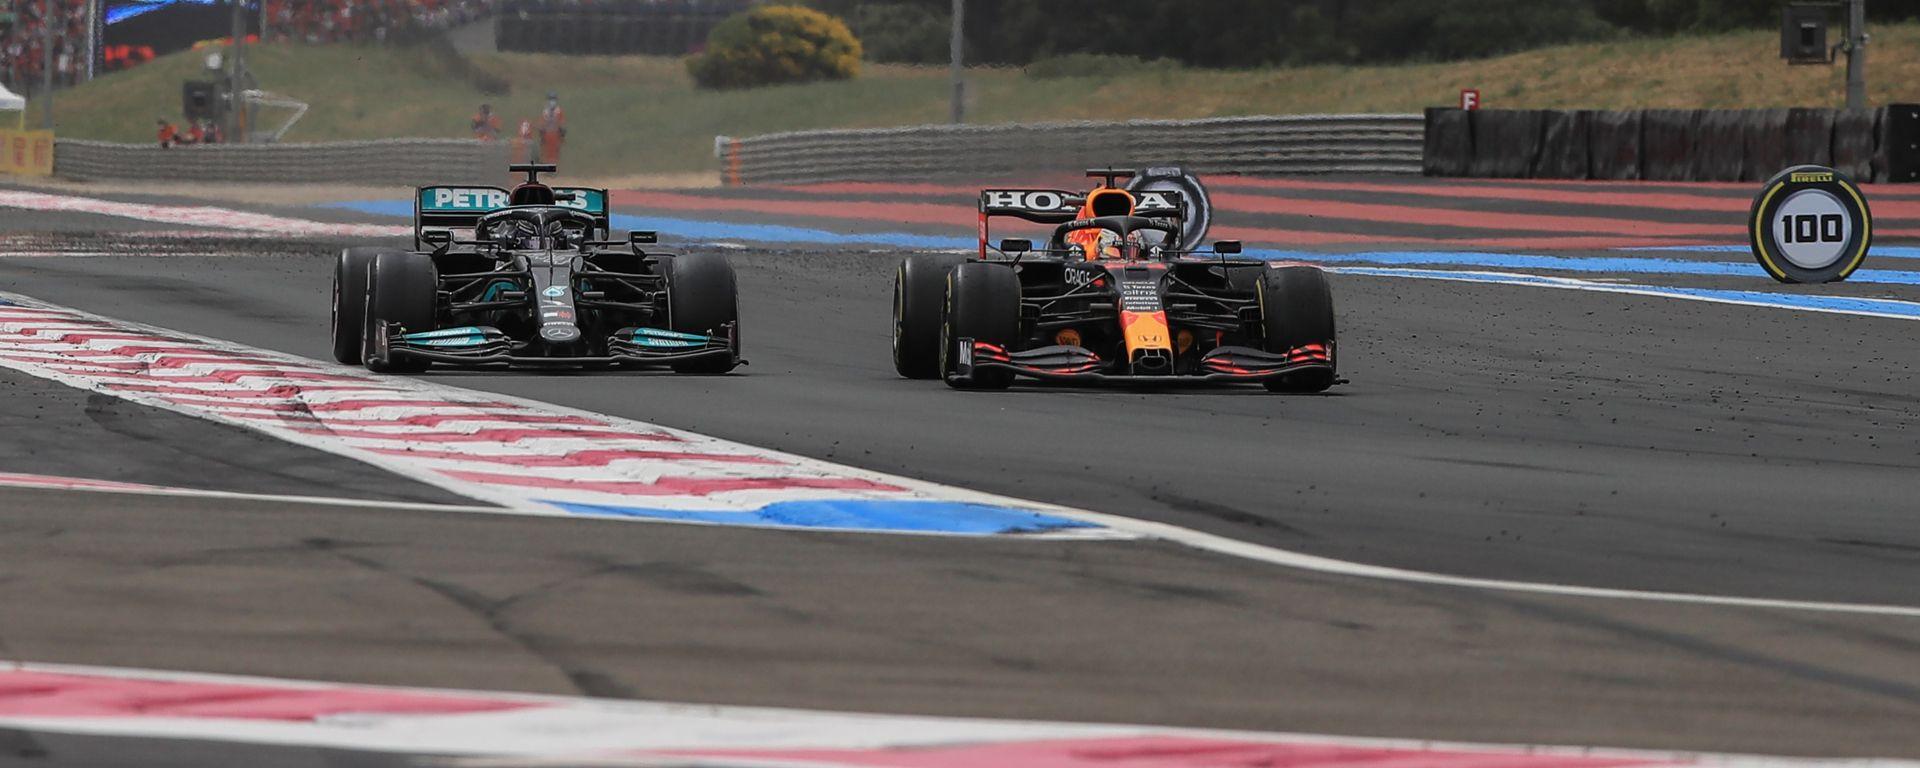 F1 GP Francia 2021, Paul Ricard: Il sorpasso di Max Verstappen (Red Bull) a Lewis Hamilton (Mercedes)